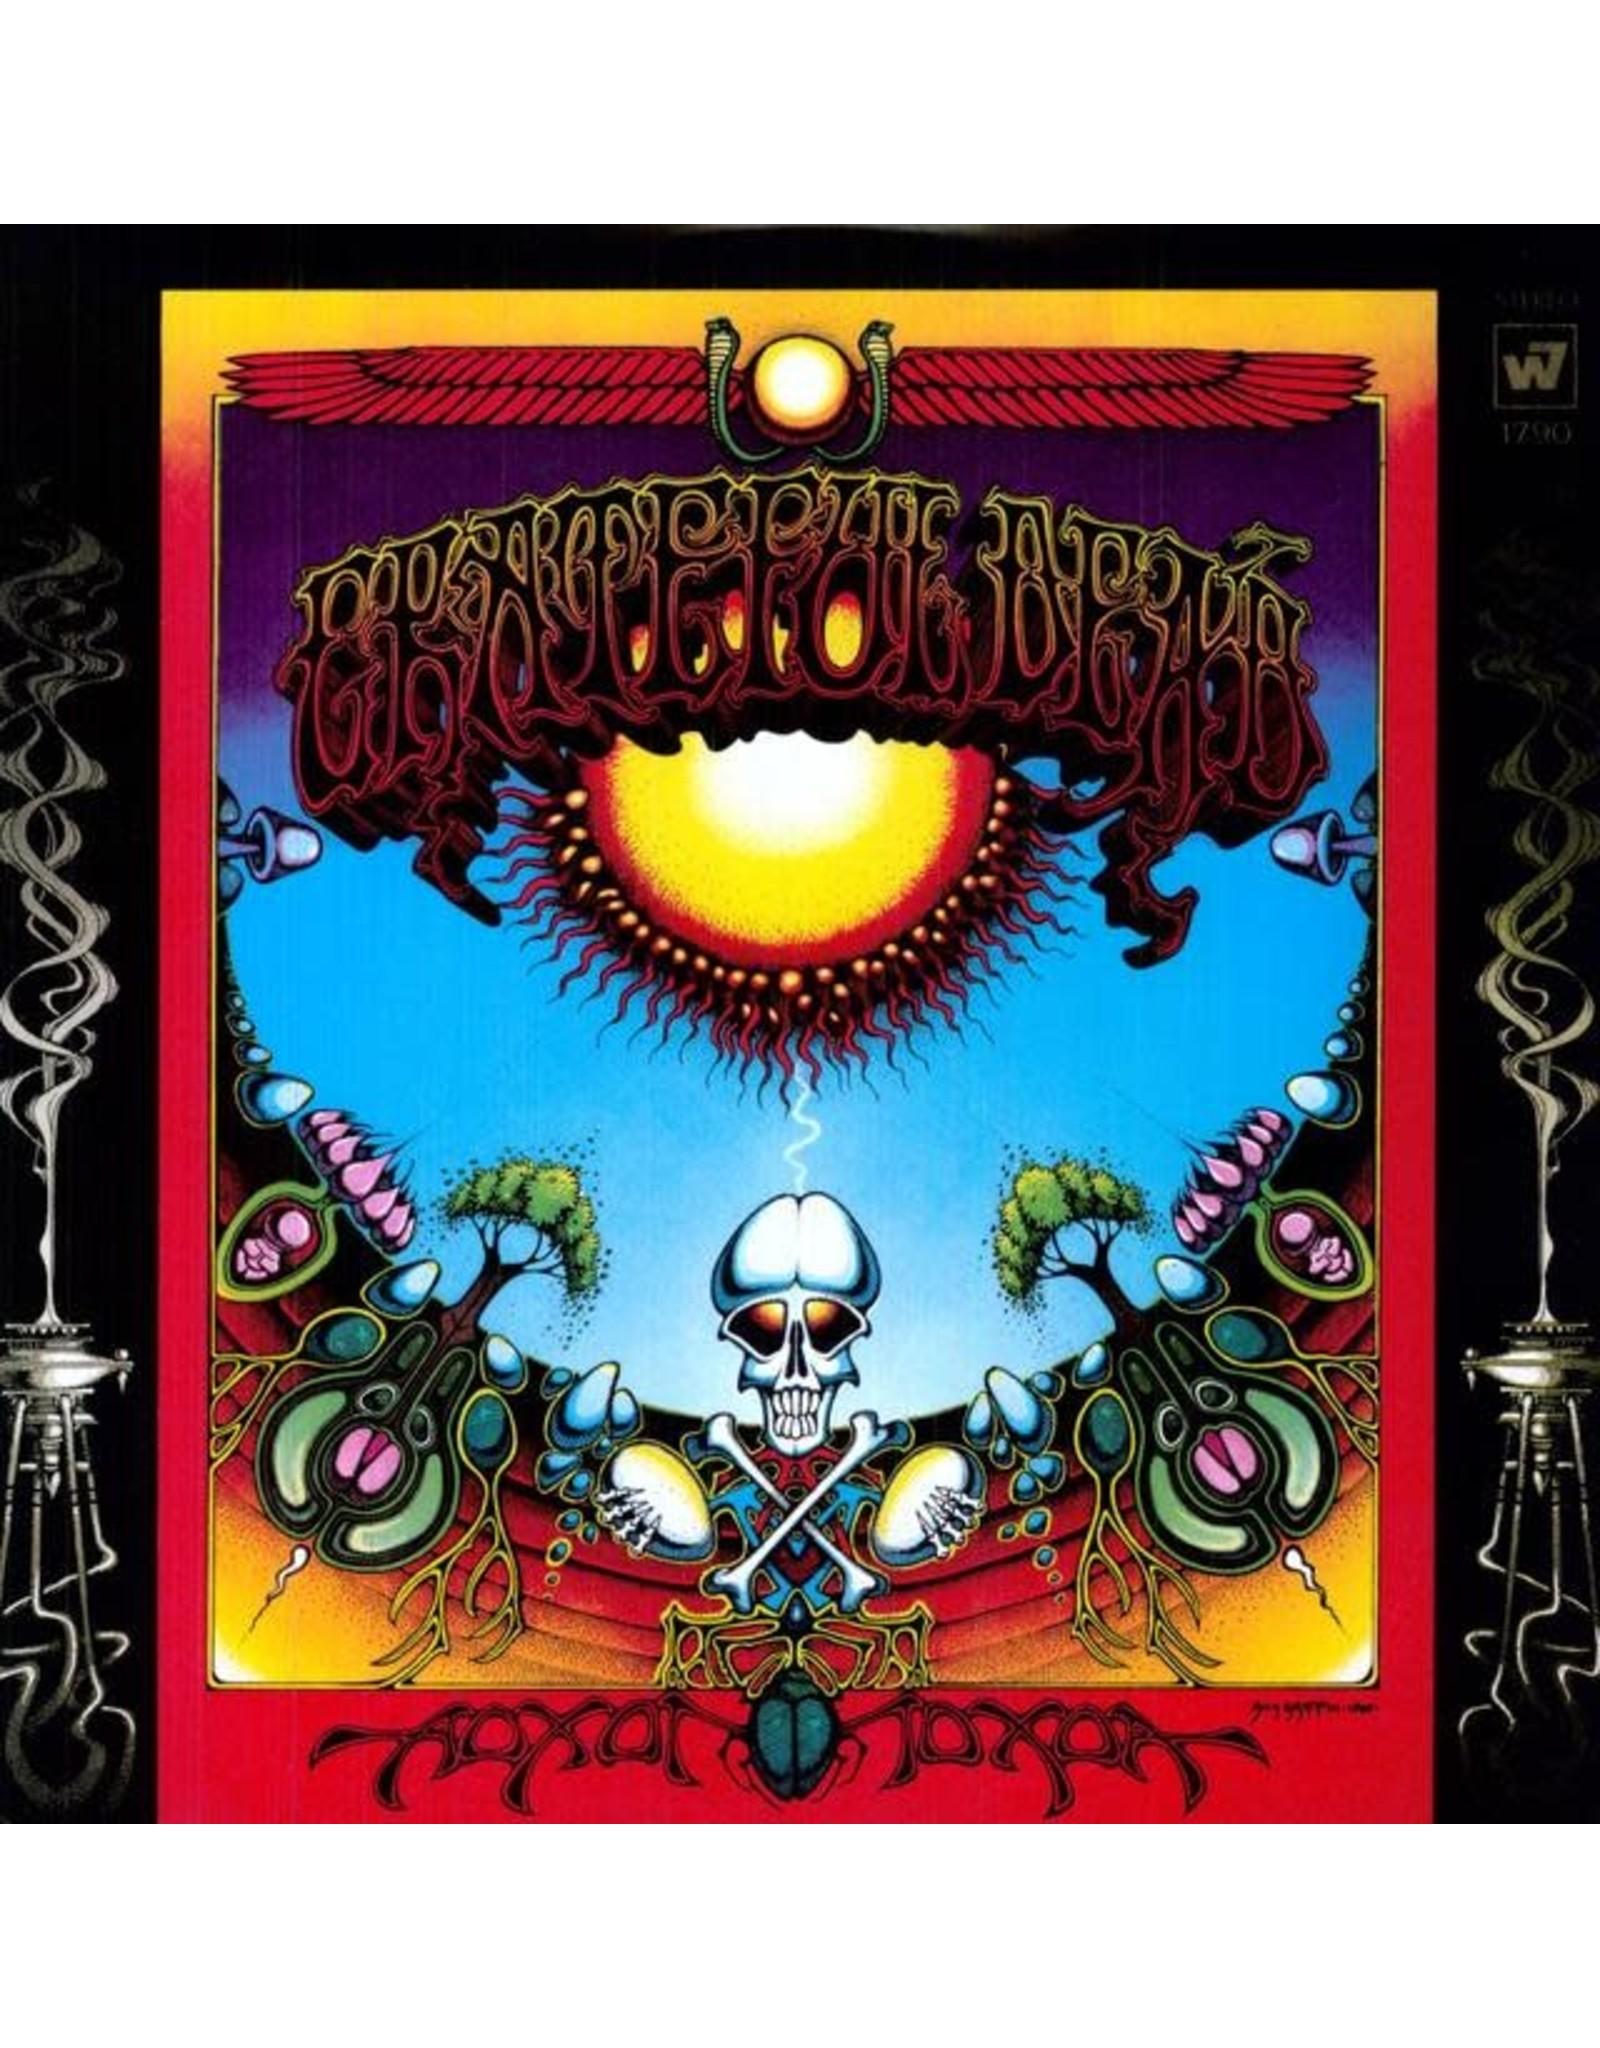 Vinyl The Grateful Dead - Aoxomoxoa